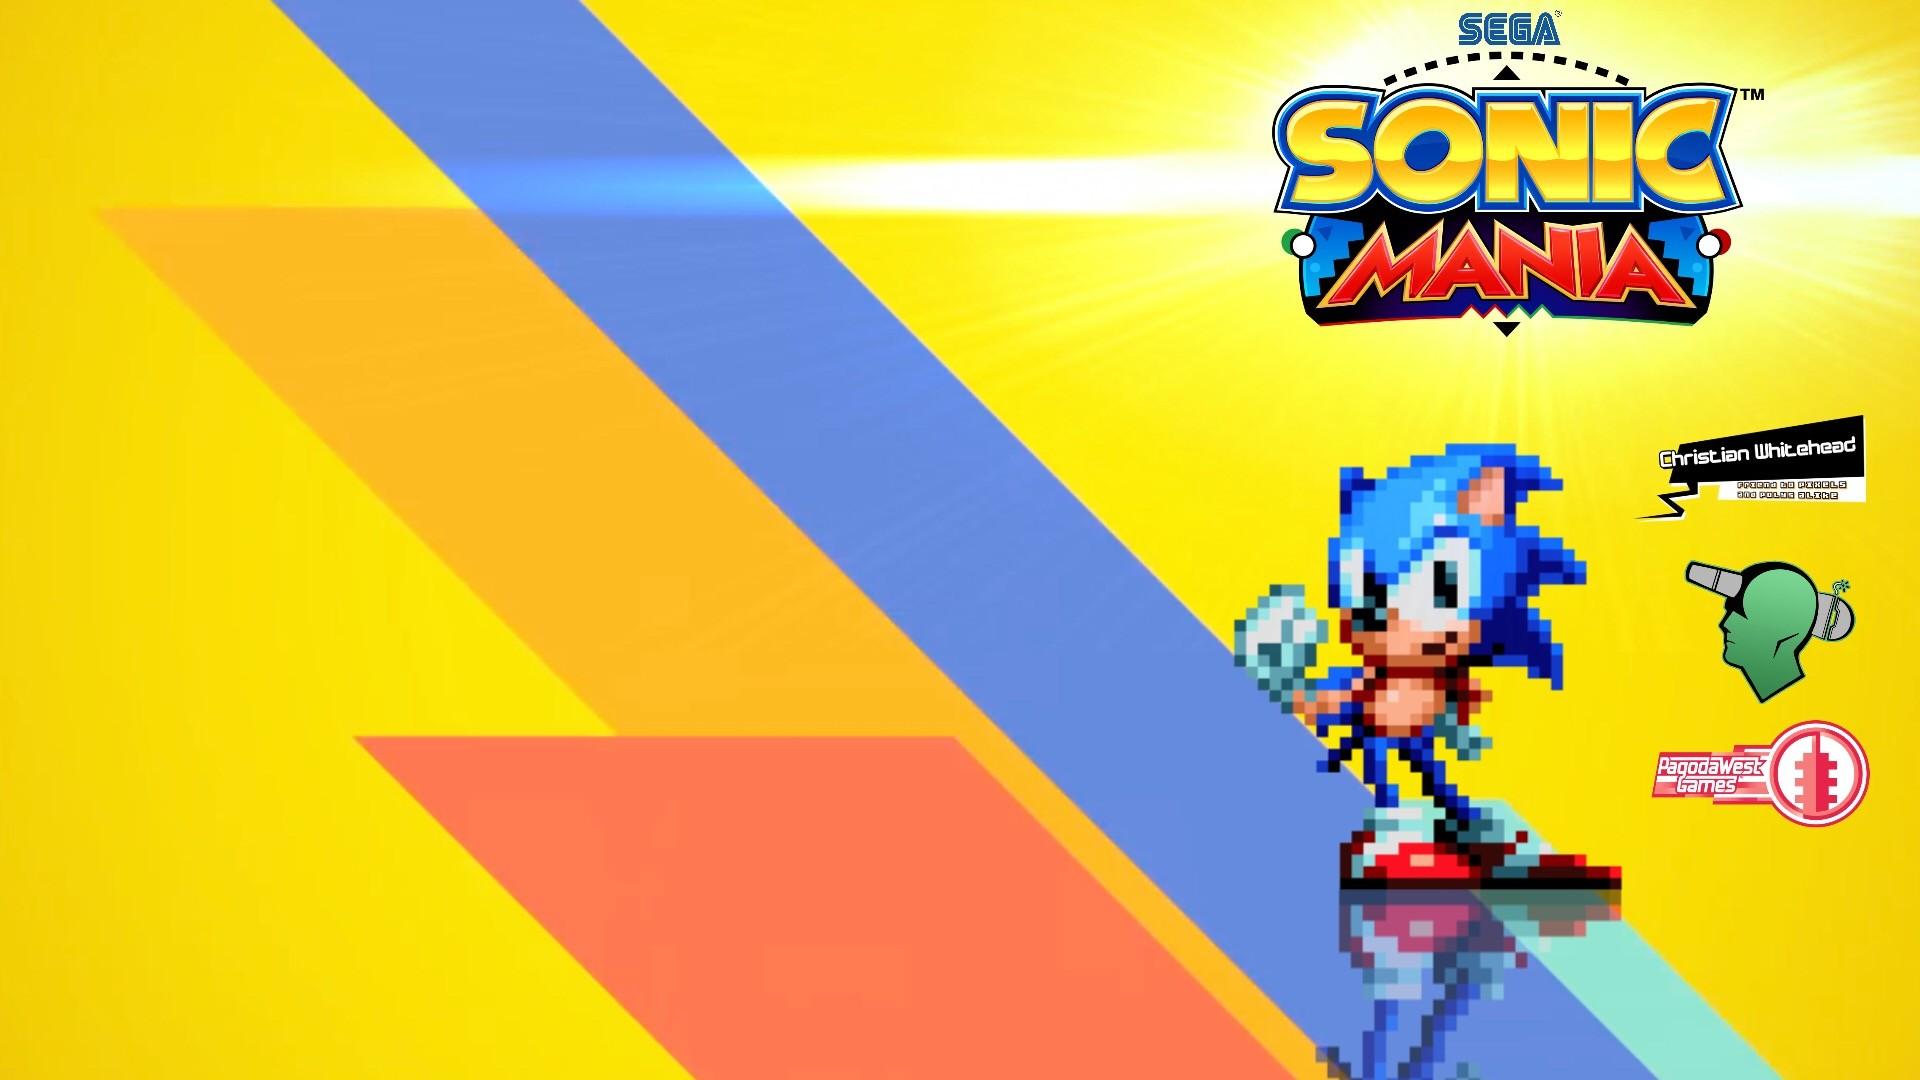 Sonic Mania Wallpaper for Desktop by AaronKasarion Sonic Mania Wallpaper  for Desktop by AaronKasarion